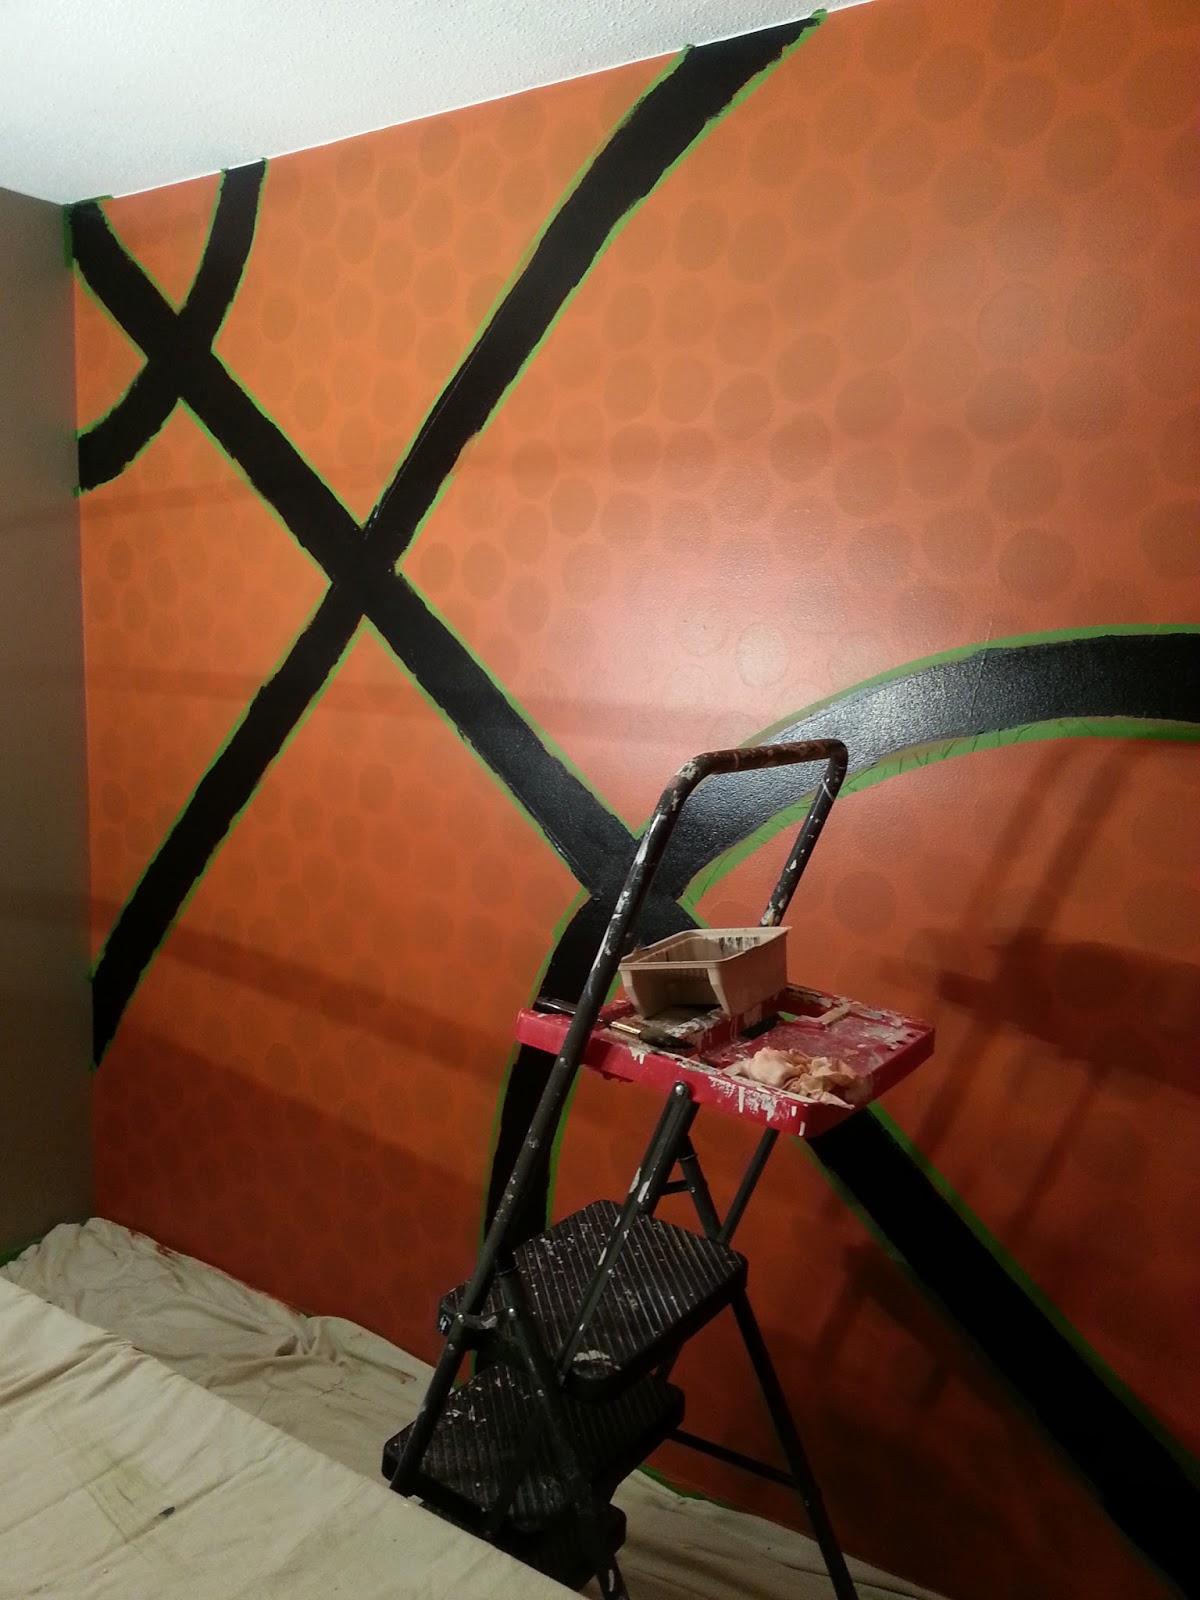 Sealed Grow Room Design: Navigating The Rutz